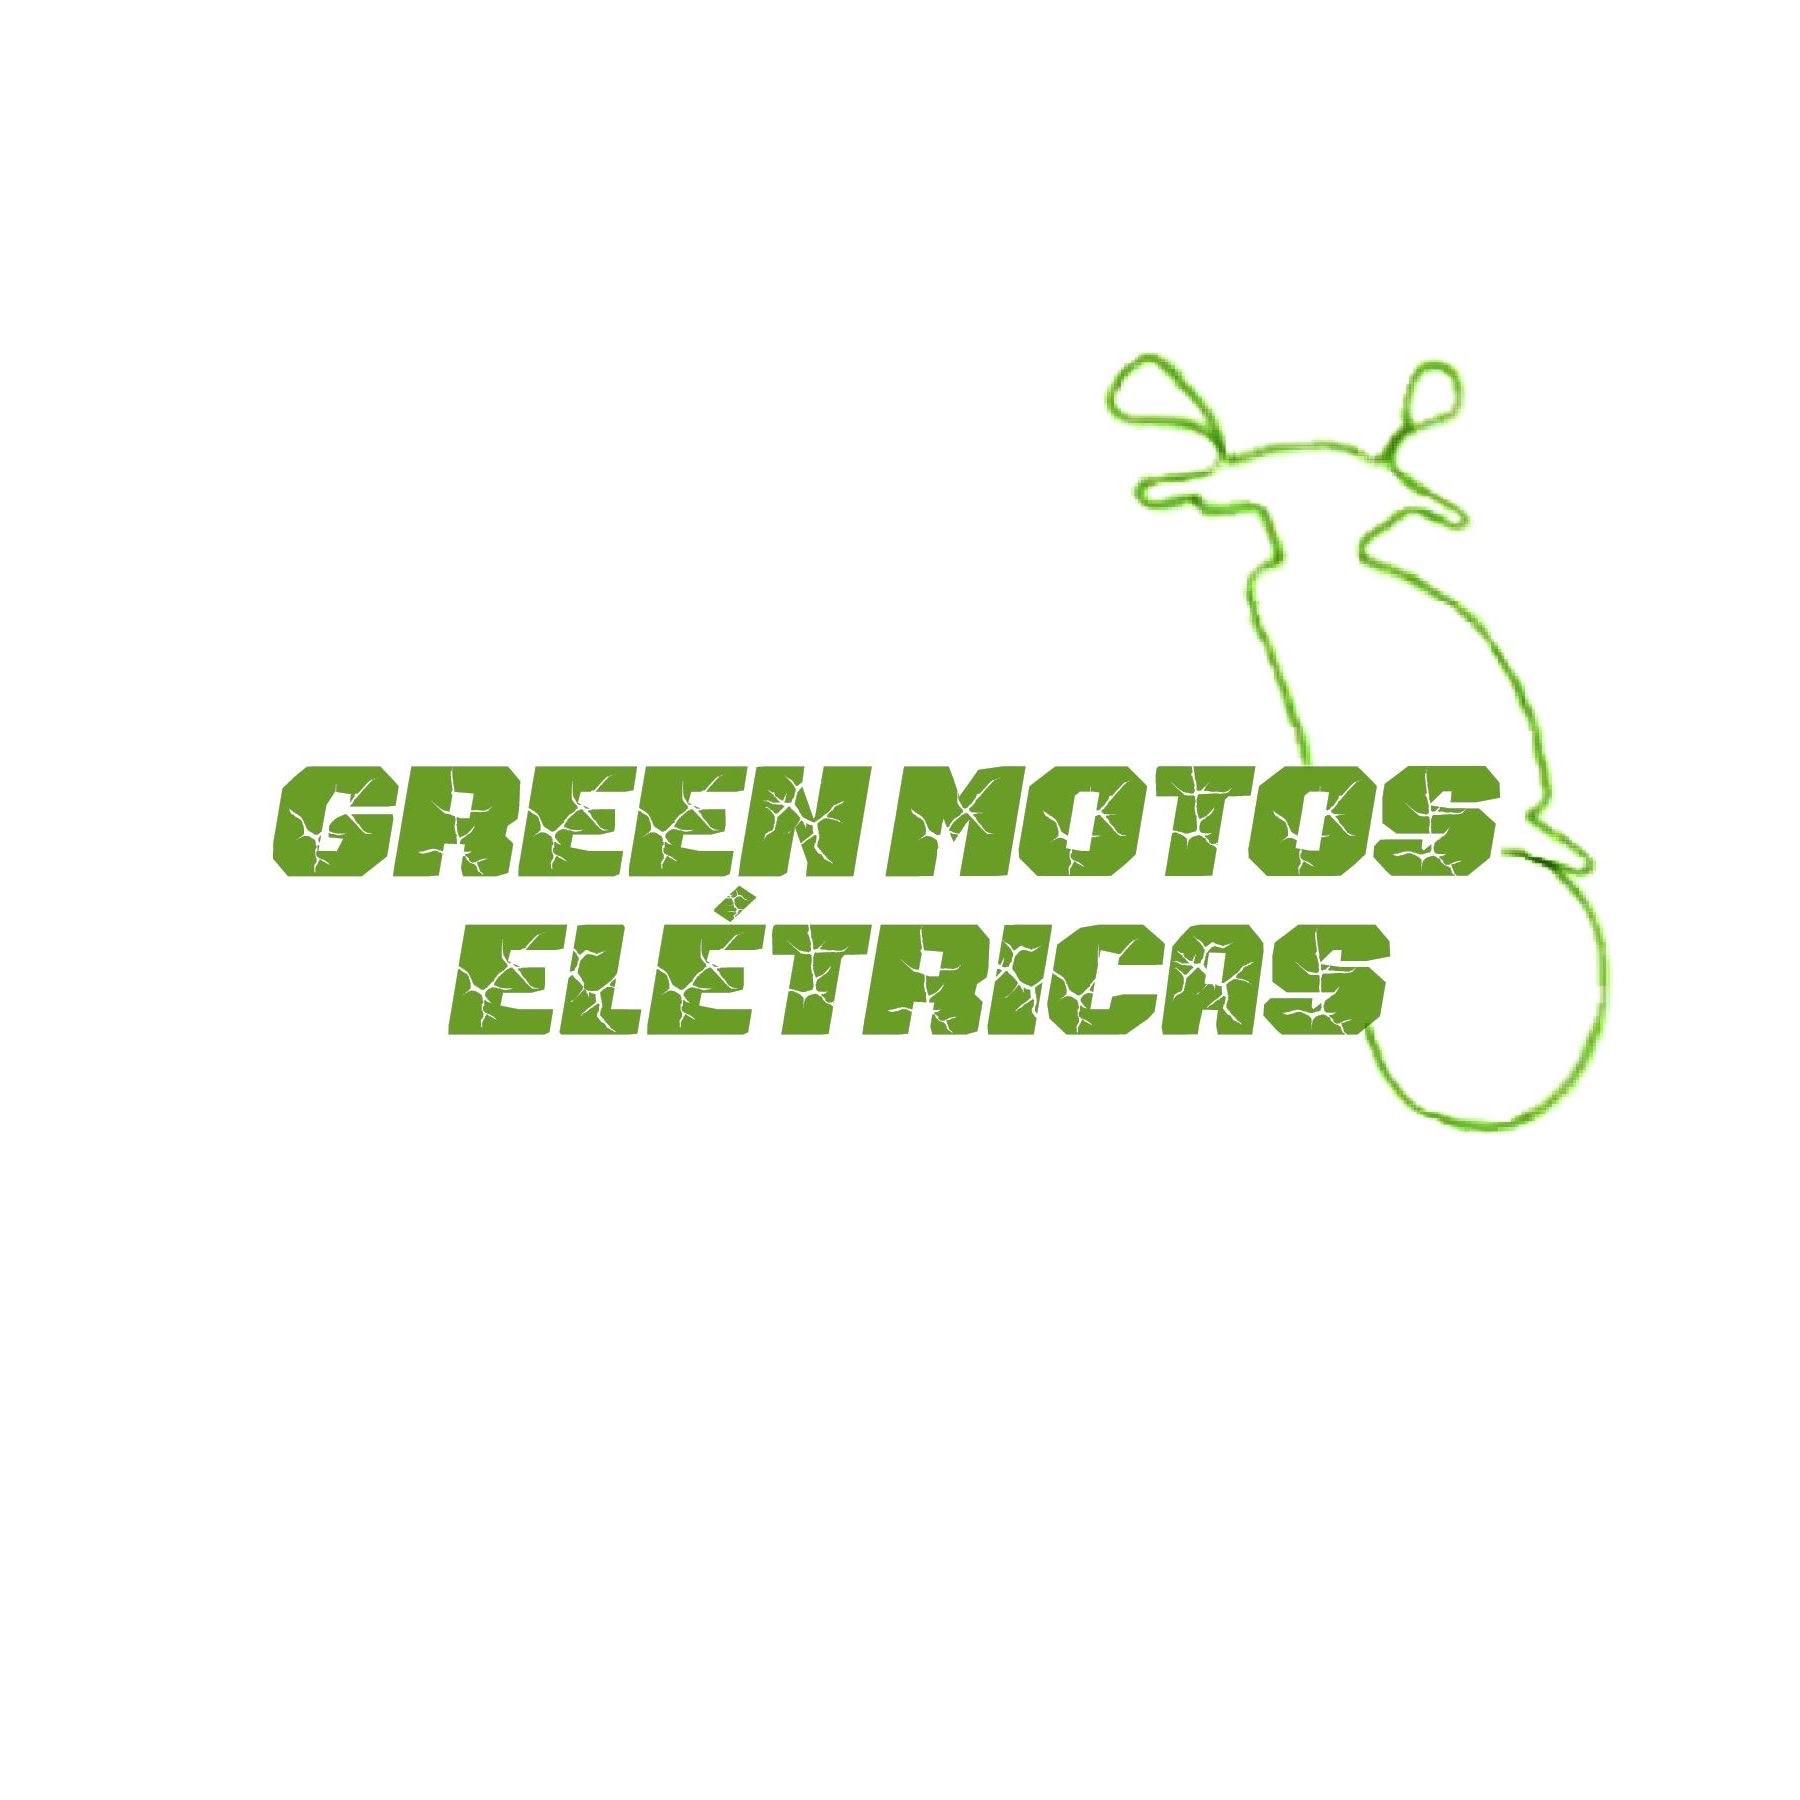 Green motos elétricas